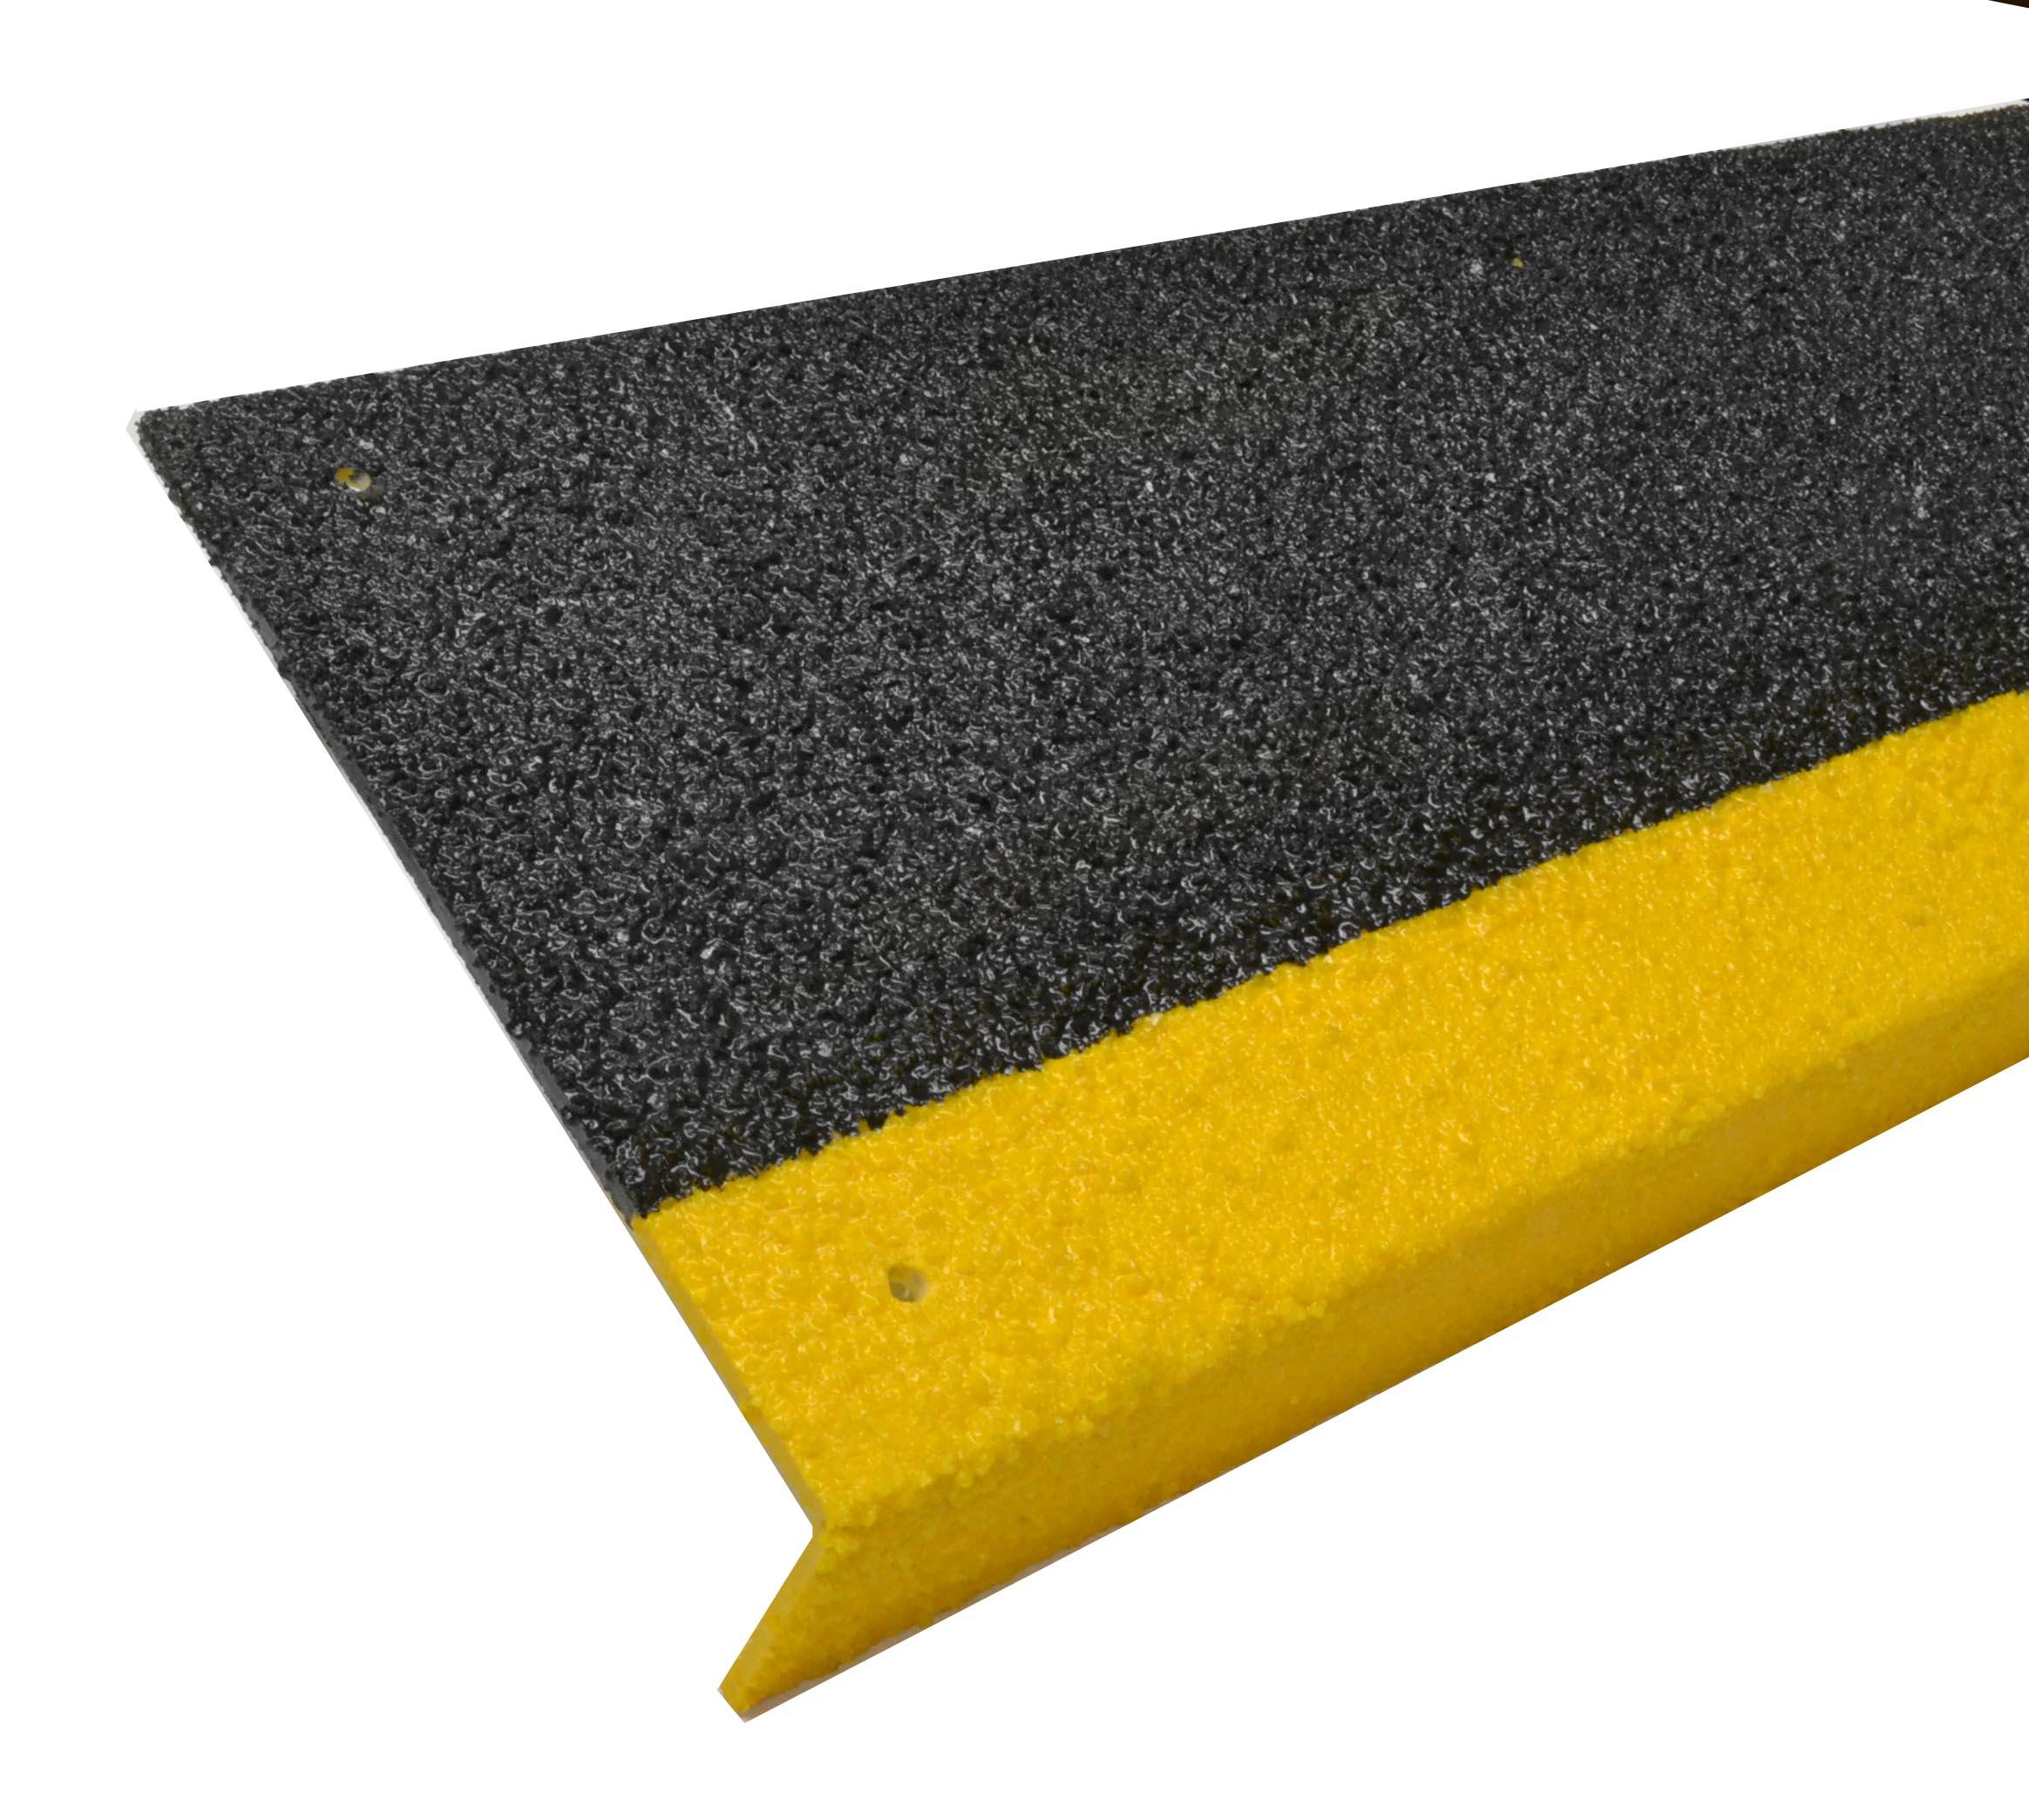 tape mat ef mats supplier shop pvc bondmat black aluminium bb others tapes malaysia protection bf bfbondmat insulation